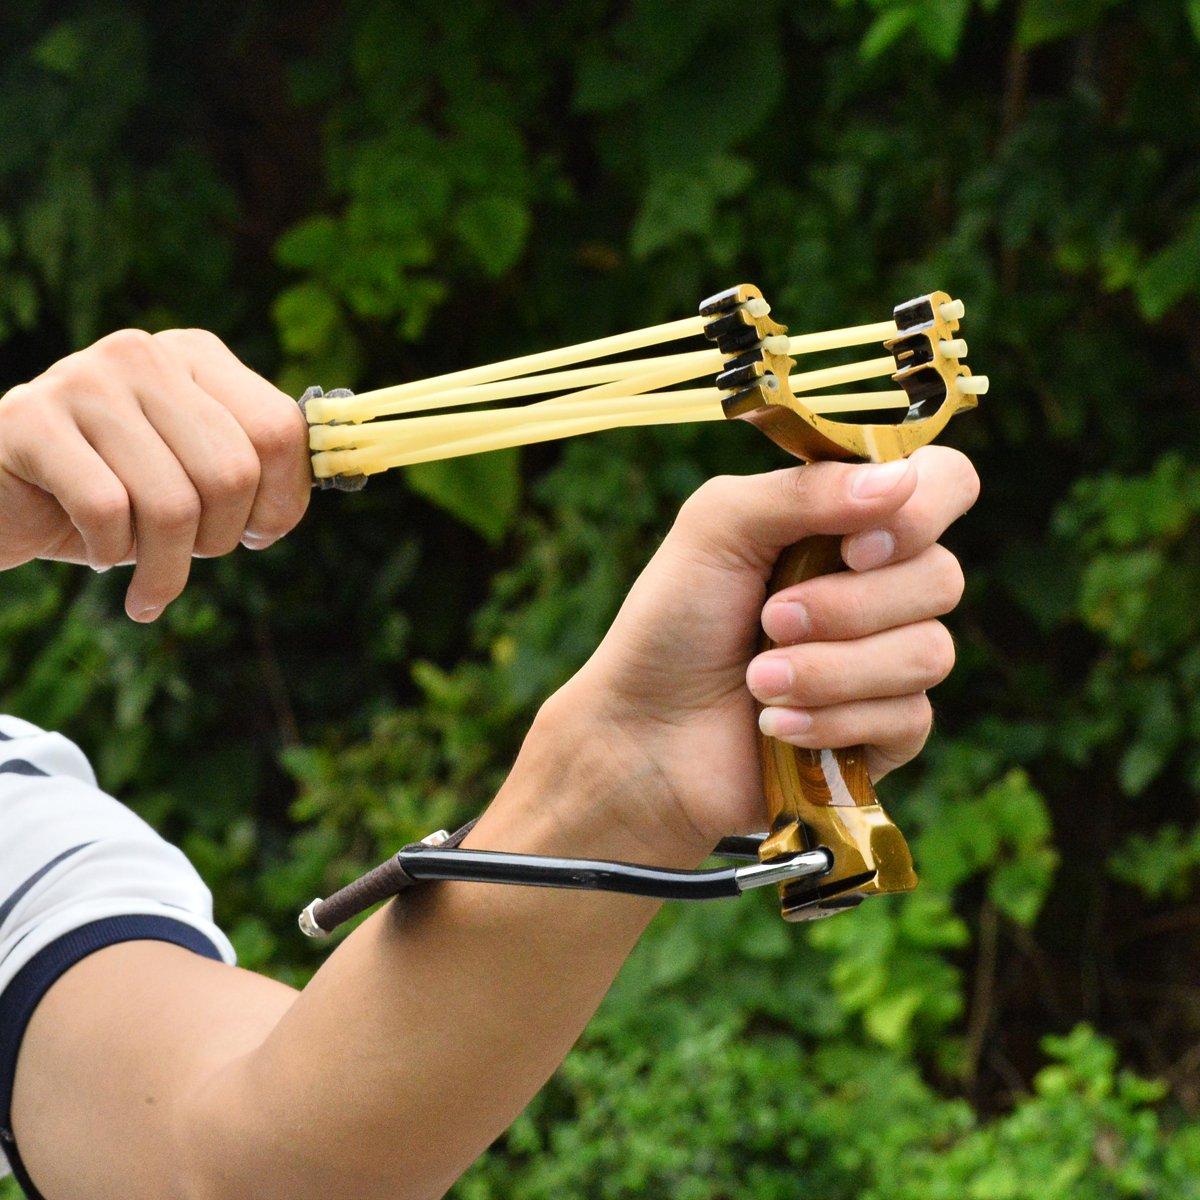 TM Popshot Outdoor Morepower Wrist Brace Sniper Catapult Sling Shot Marble Shooting Accurate Slingshots